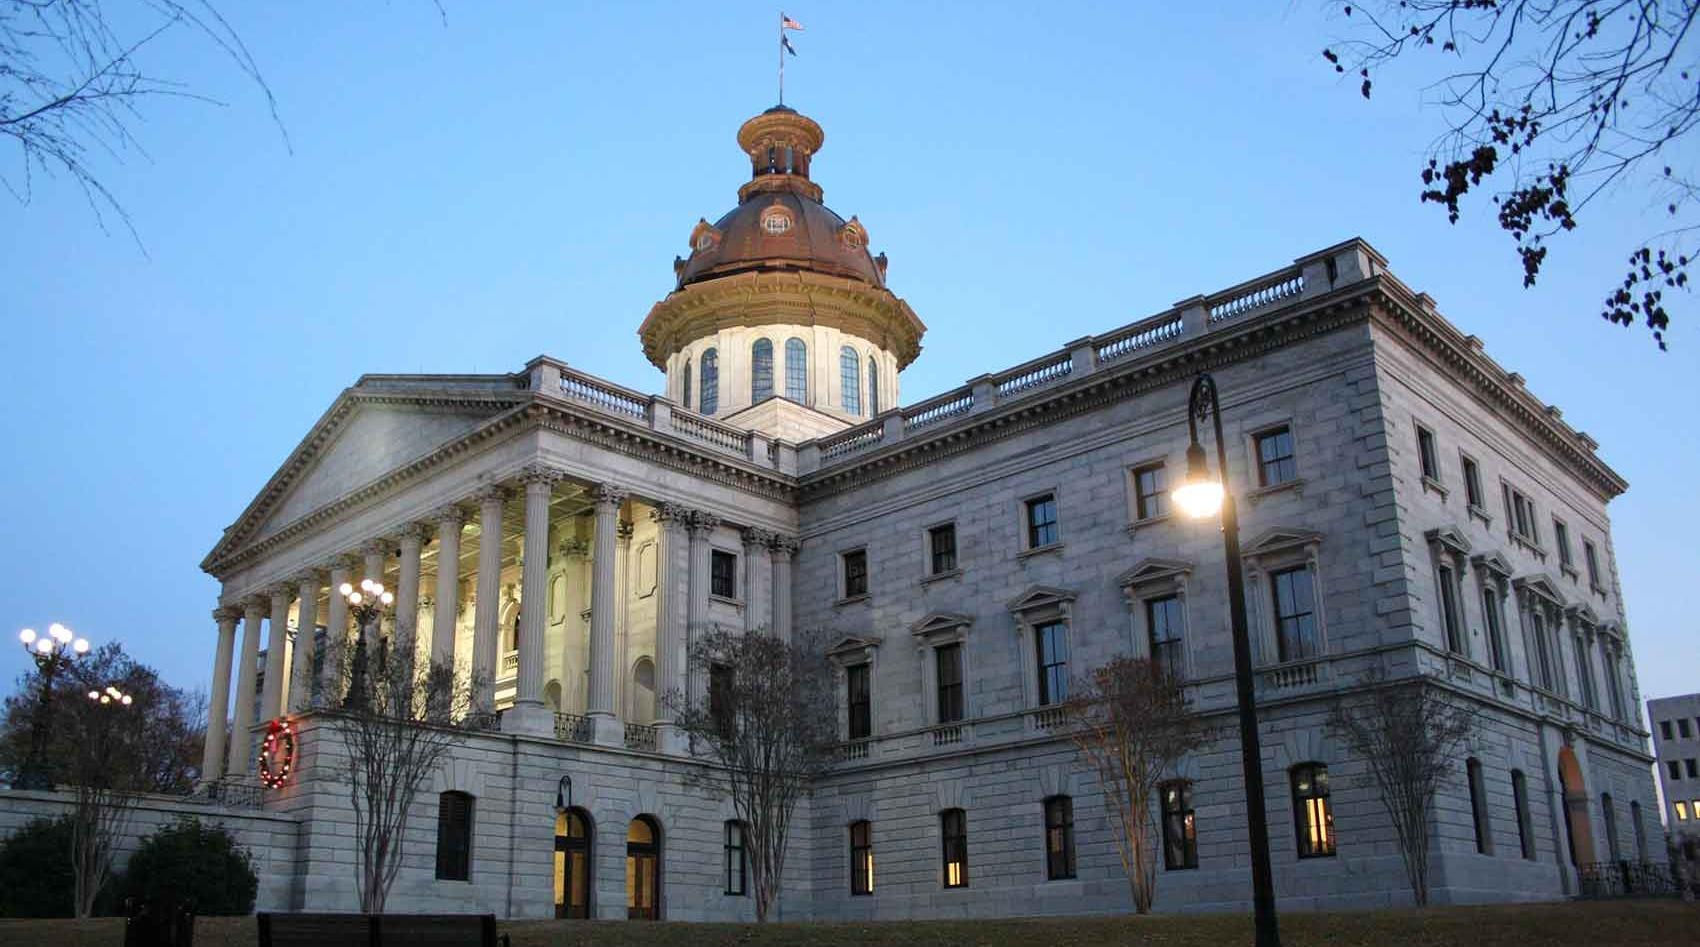 South Carolina General Assembly